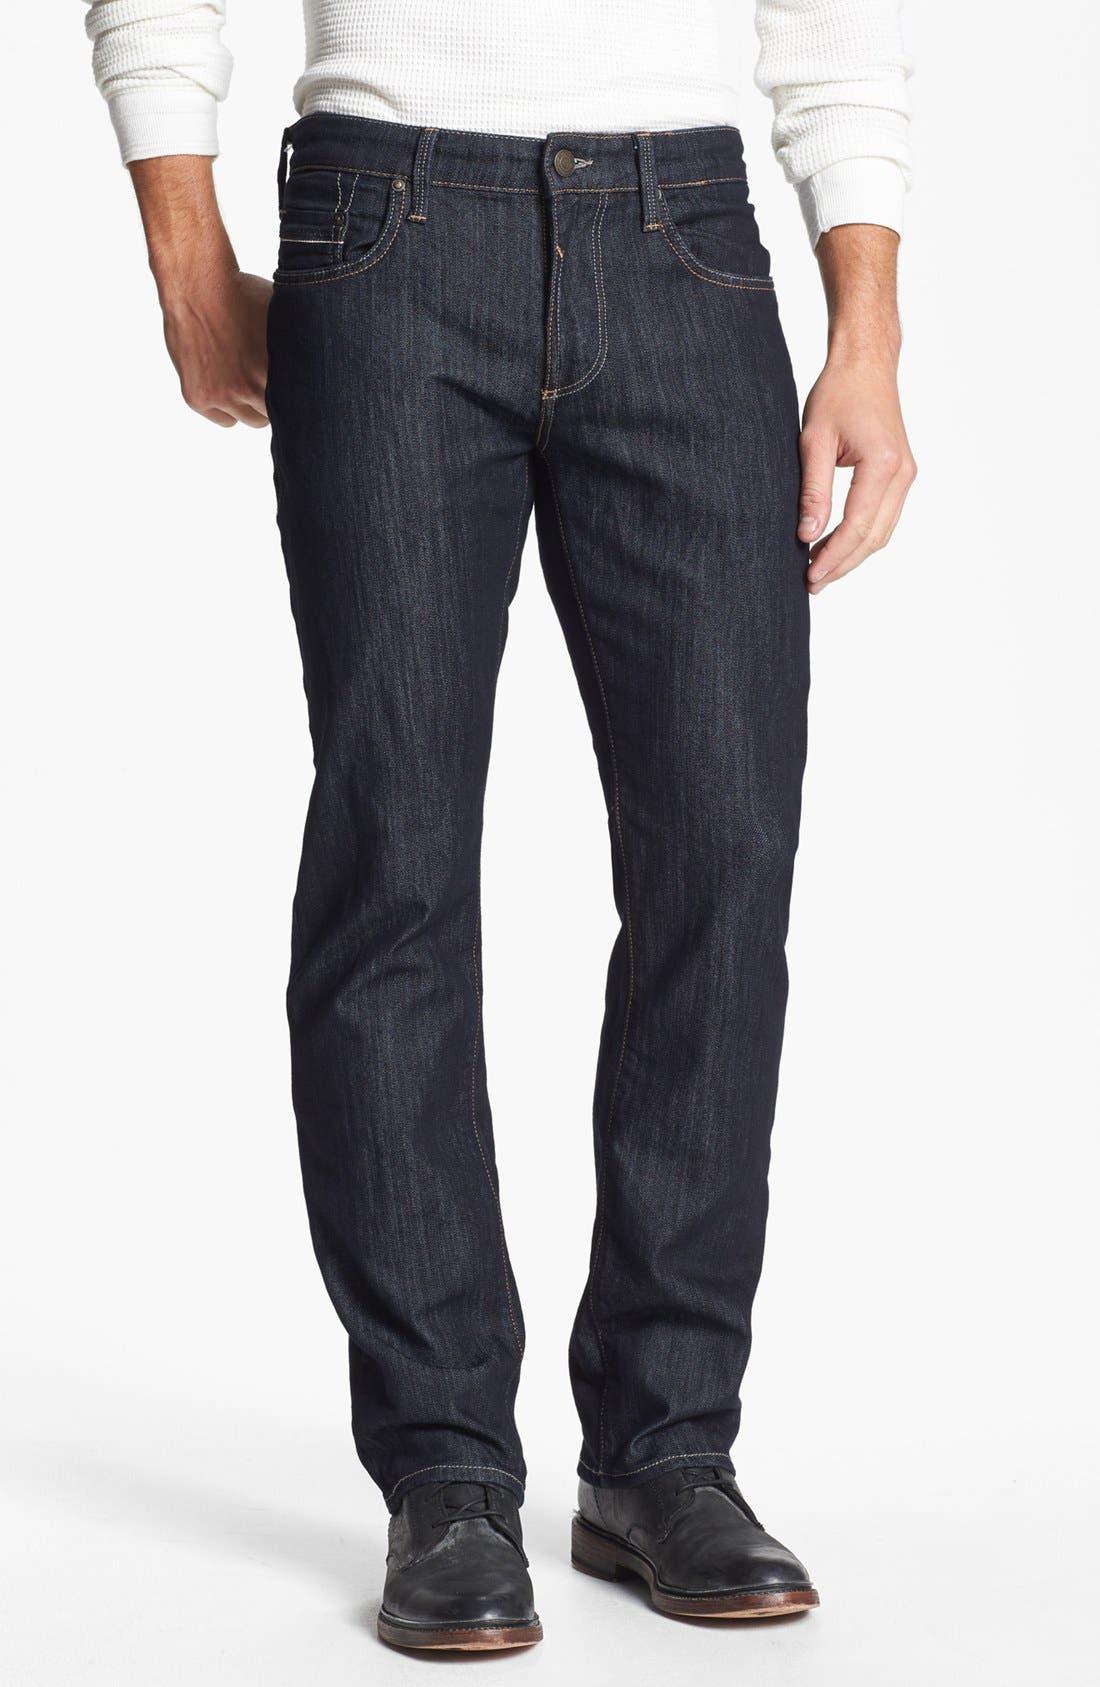 Alternate Image 1 Selected - Mavi Jeans 'Zach' Straight Leg Jeans (Rinse Kensington)